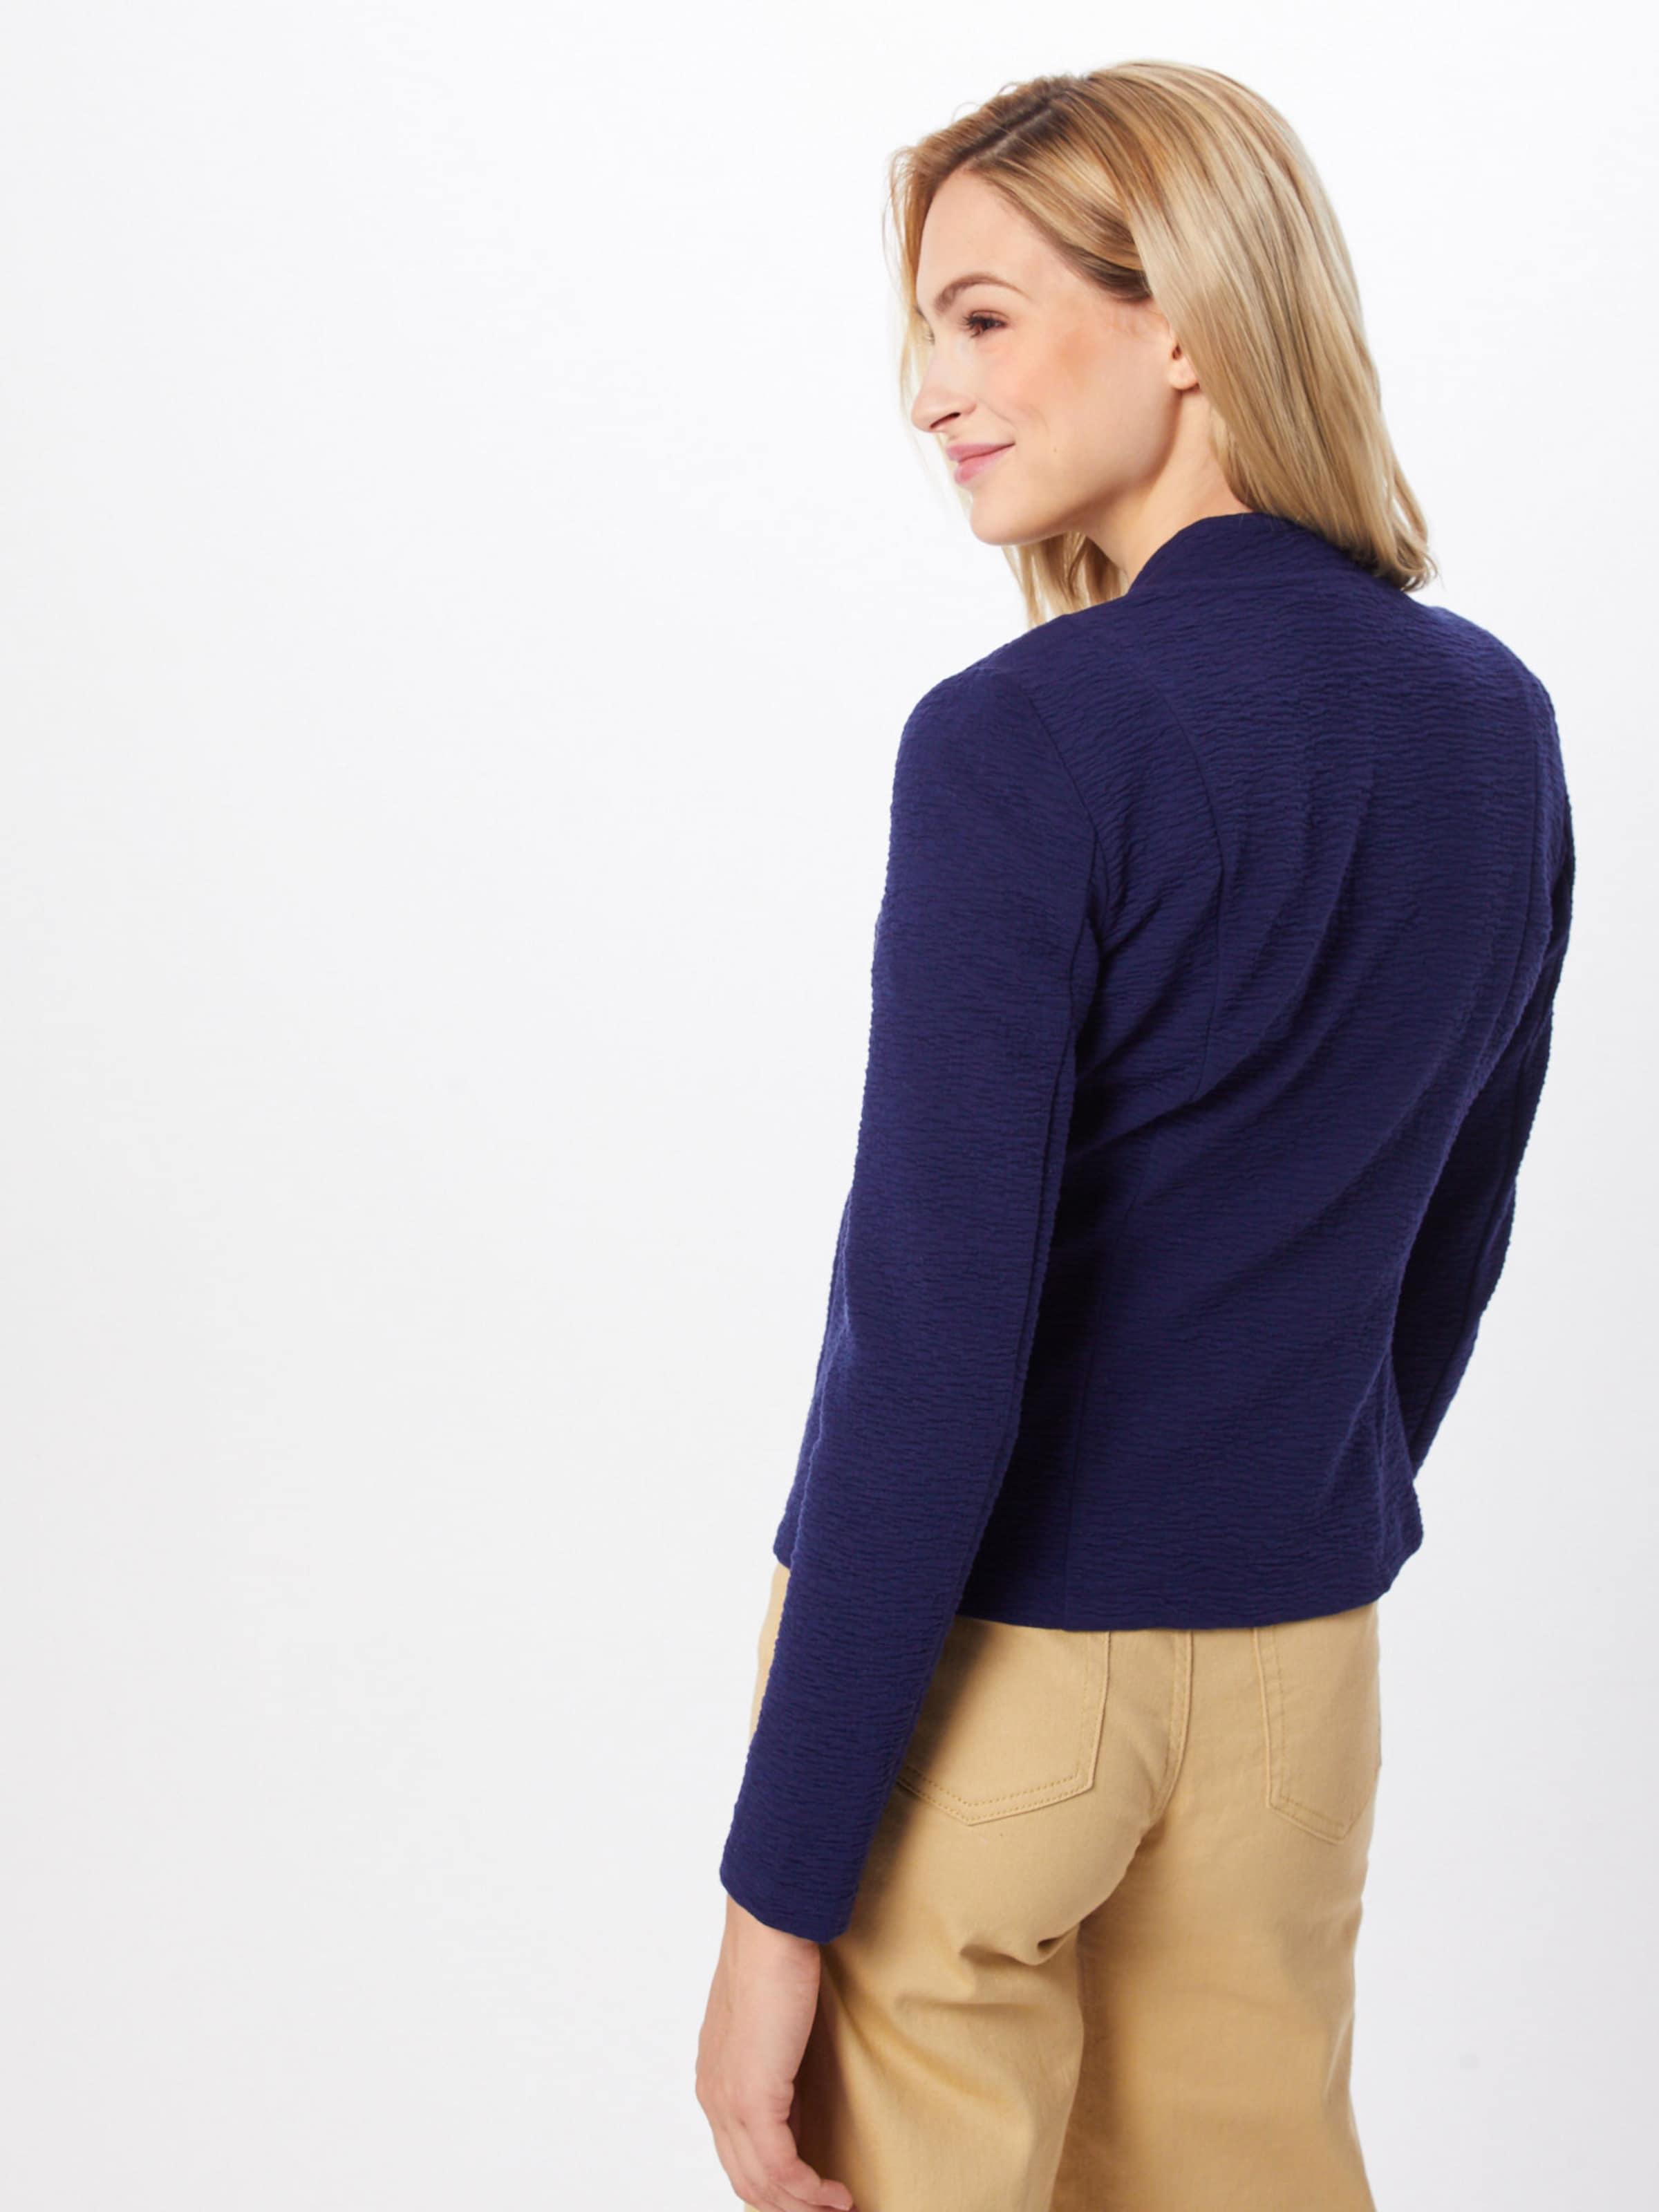 Blau Blazer In Tom Denim Tailor 0wPXOk8n